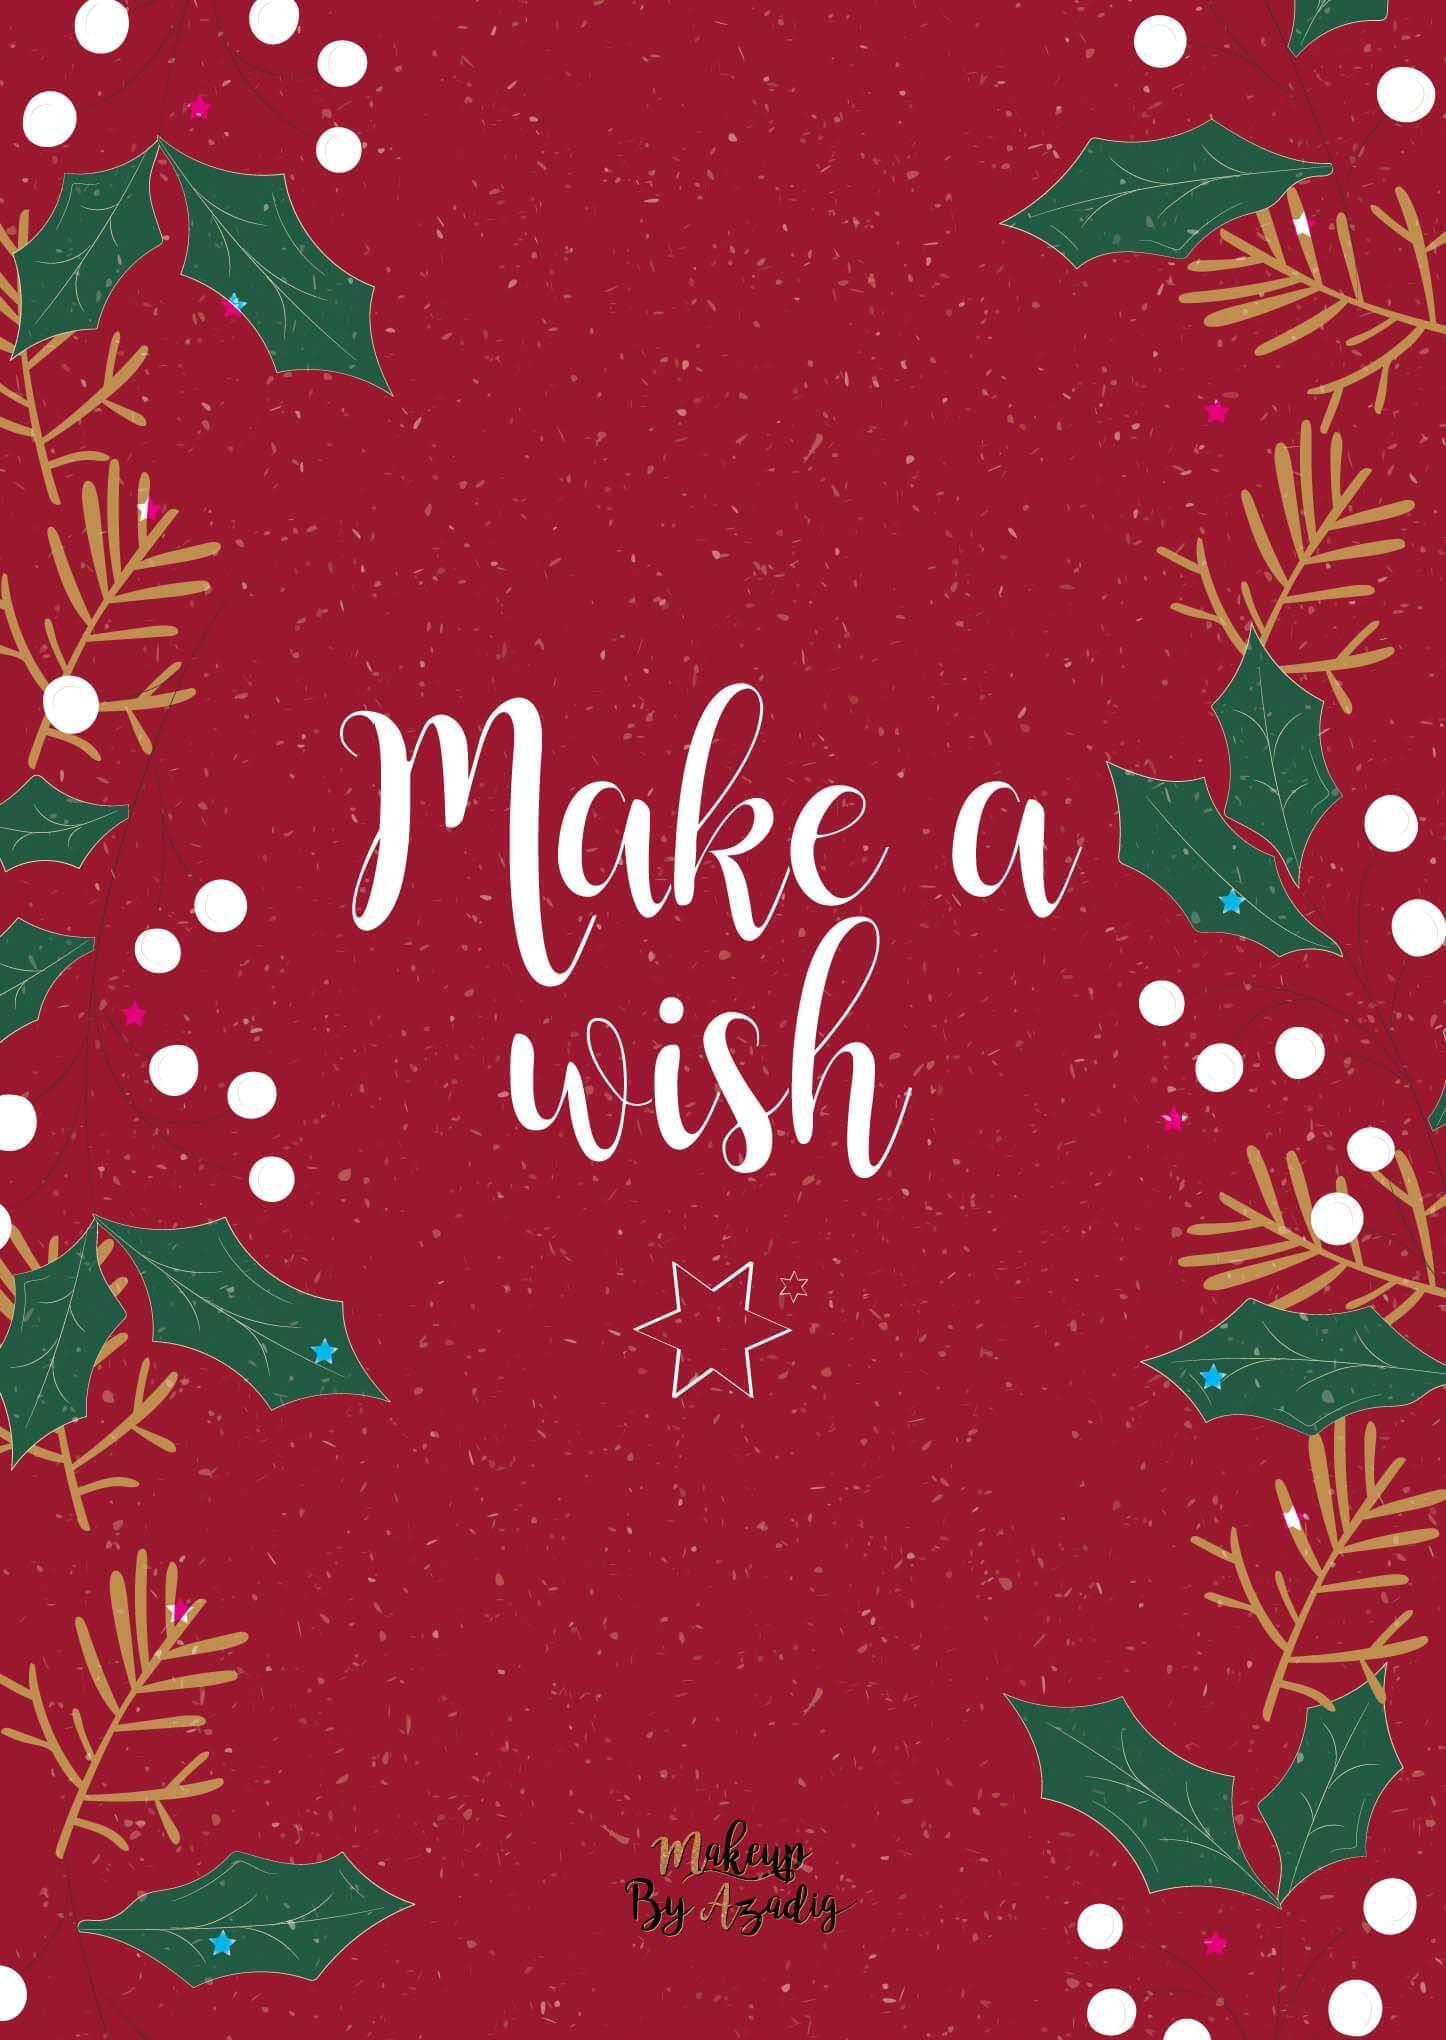 fond-decran-wallpaper-christmas-noel-make-a-wish-ipad-tablette-apple-makeupbyazadig-tendance